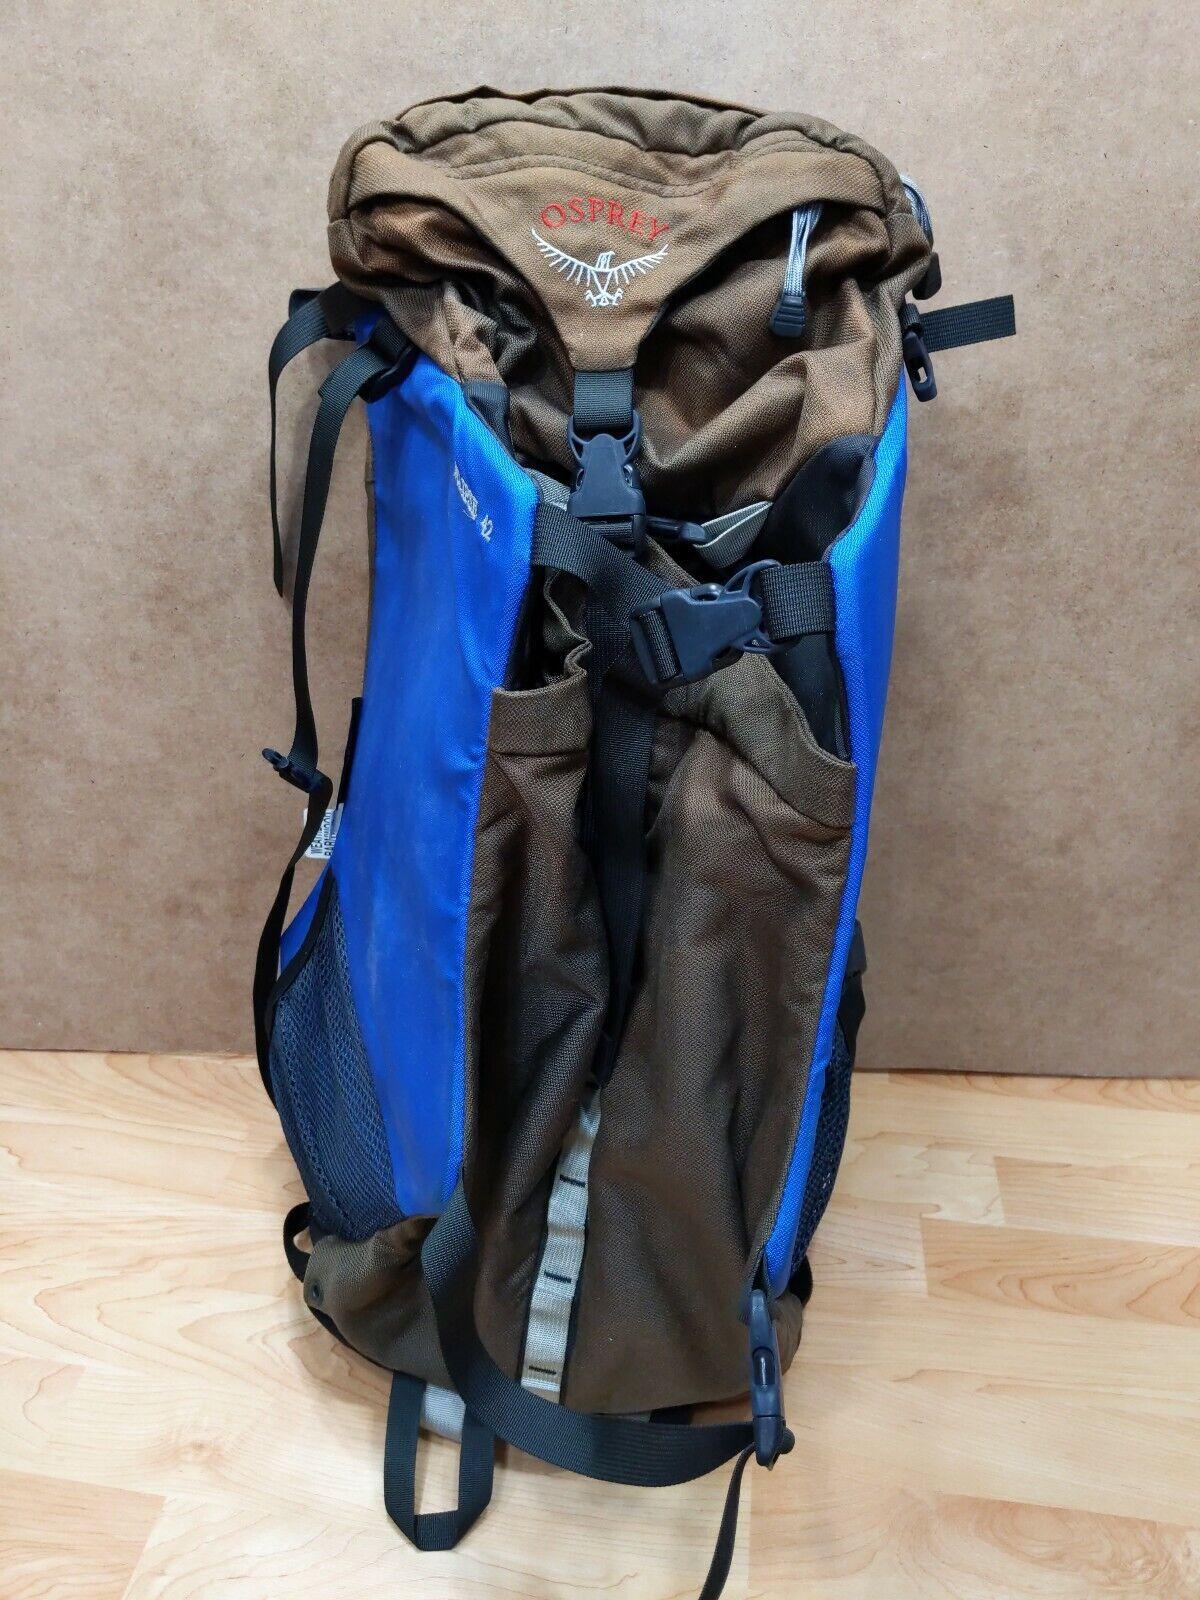 Osprey Eclipse 42 Hire Internal Frame Backpack Rucksack Diuominiione gree GUC